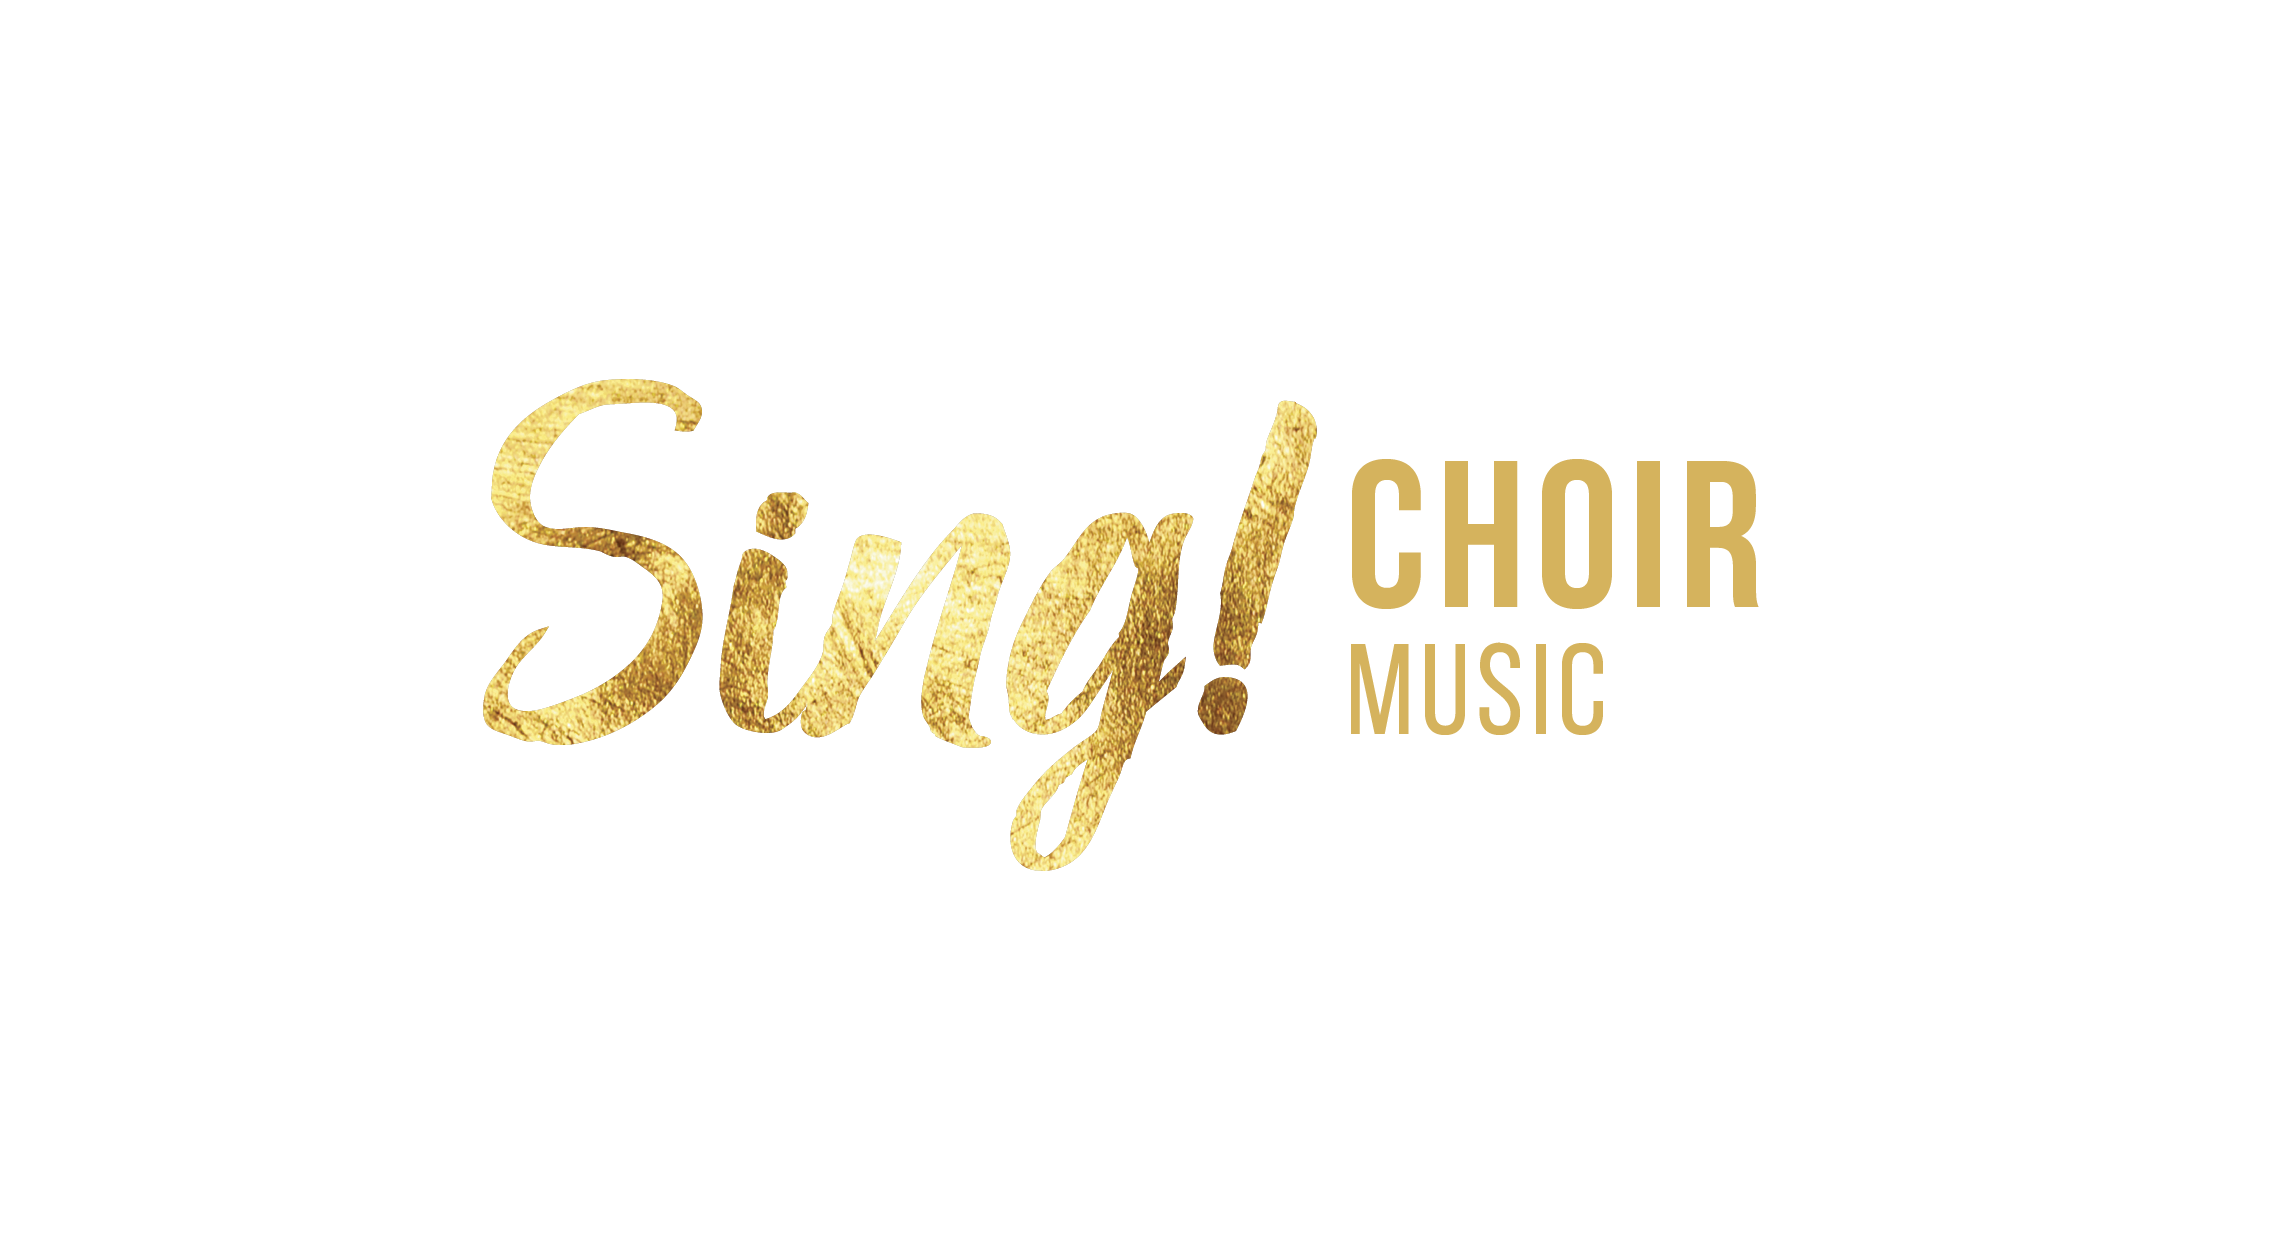 sing web banner - choir music.png